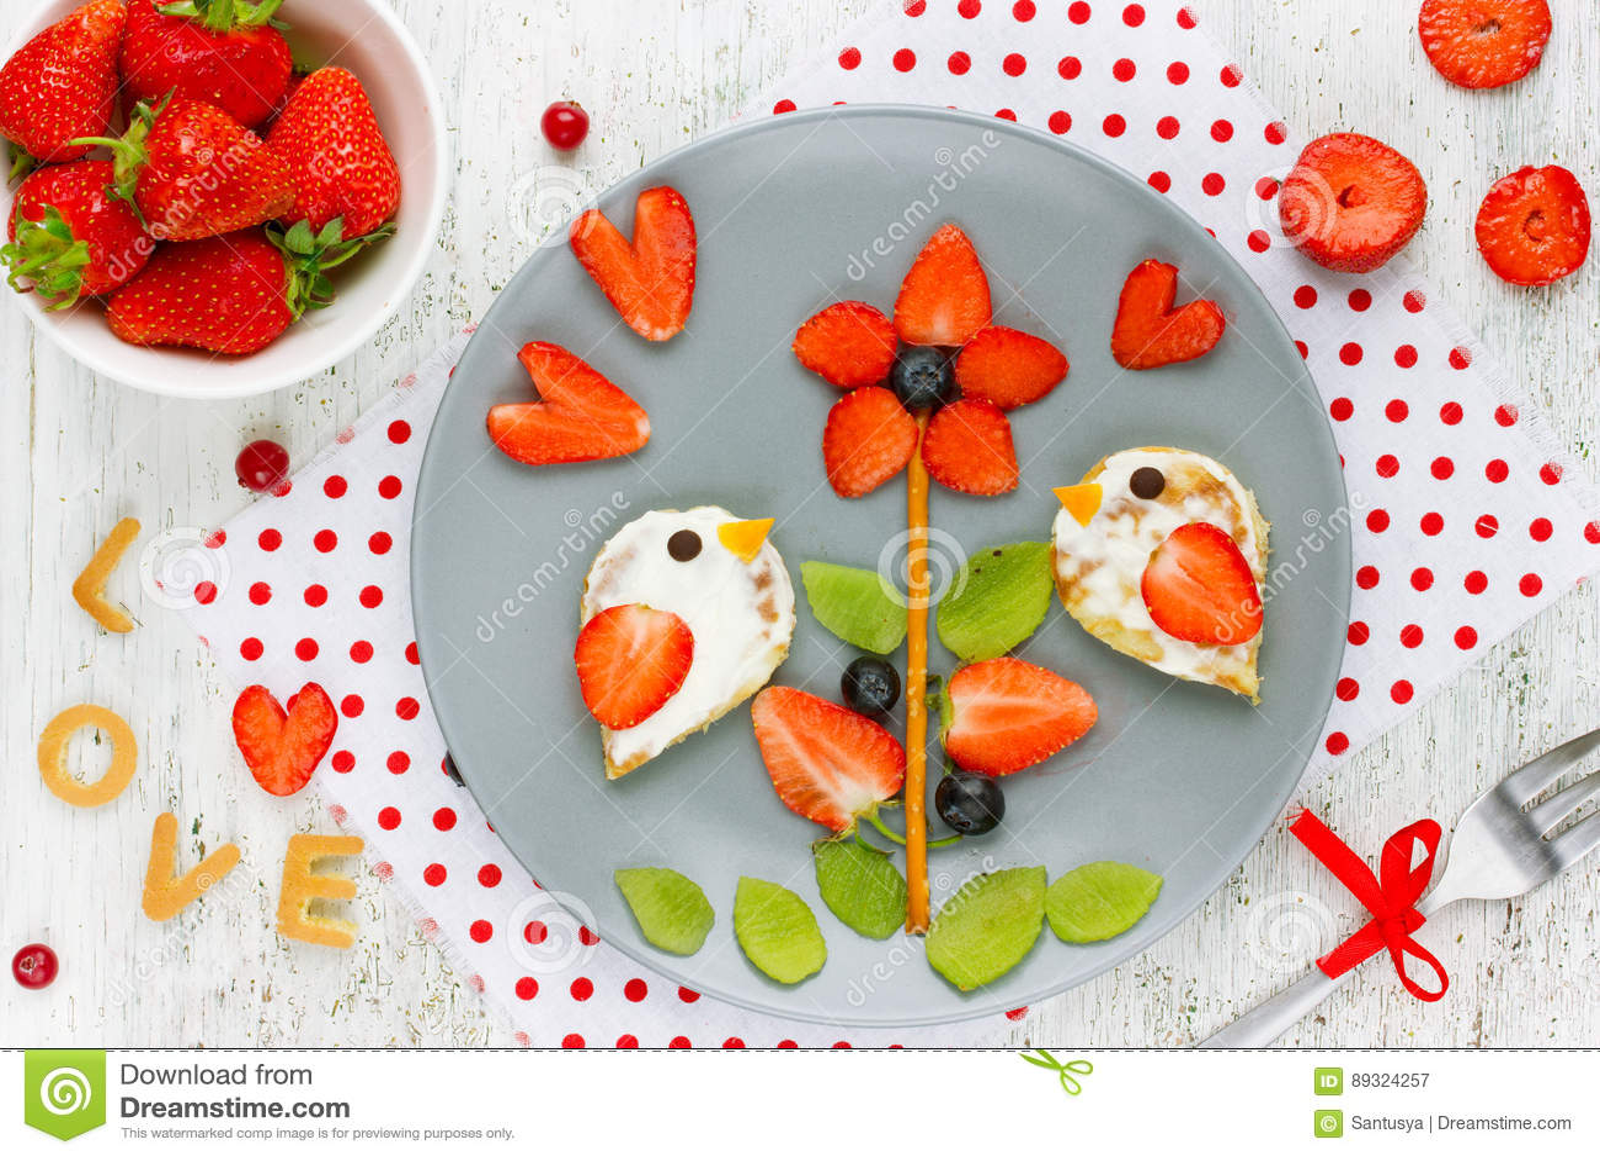 Food art idea for kids - bird pancakes with strawberry kiwi blue